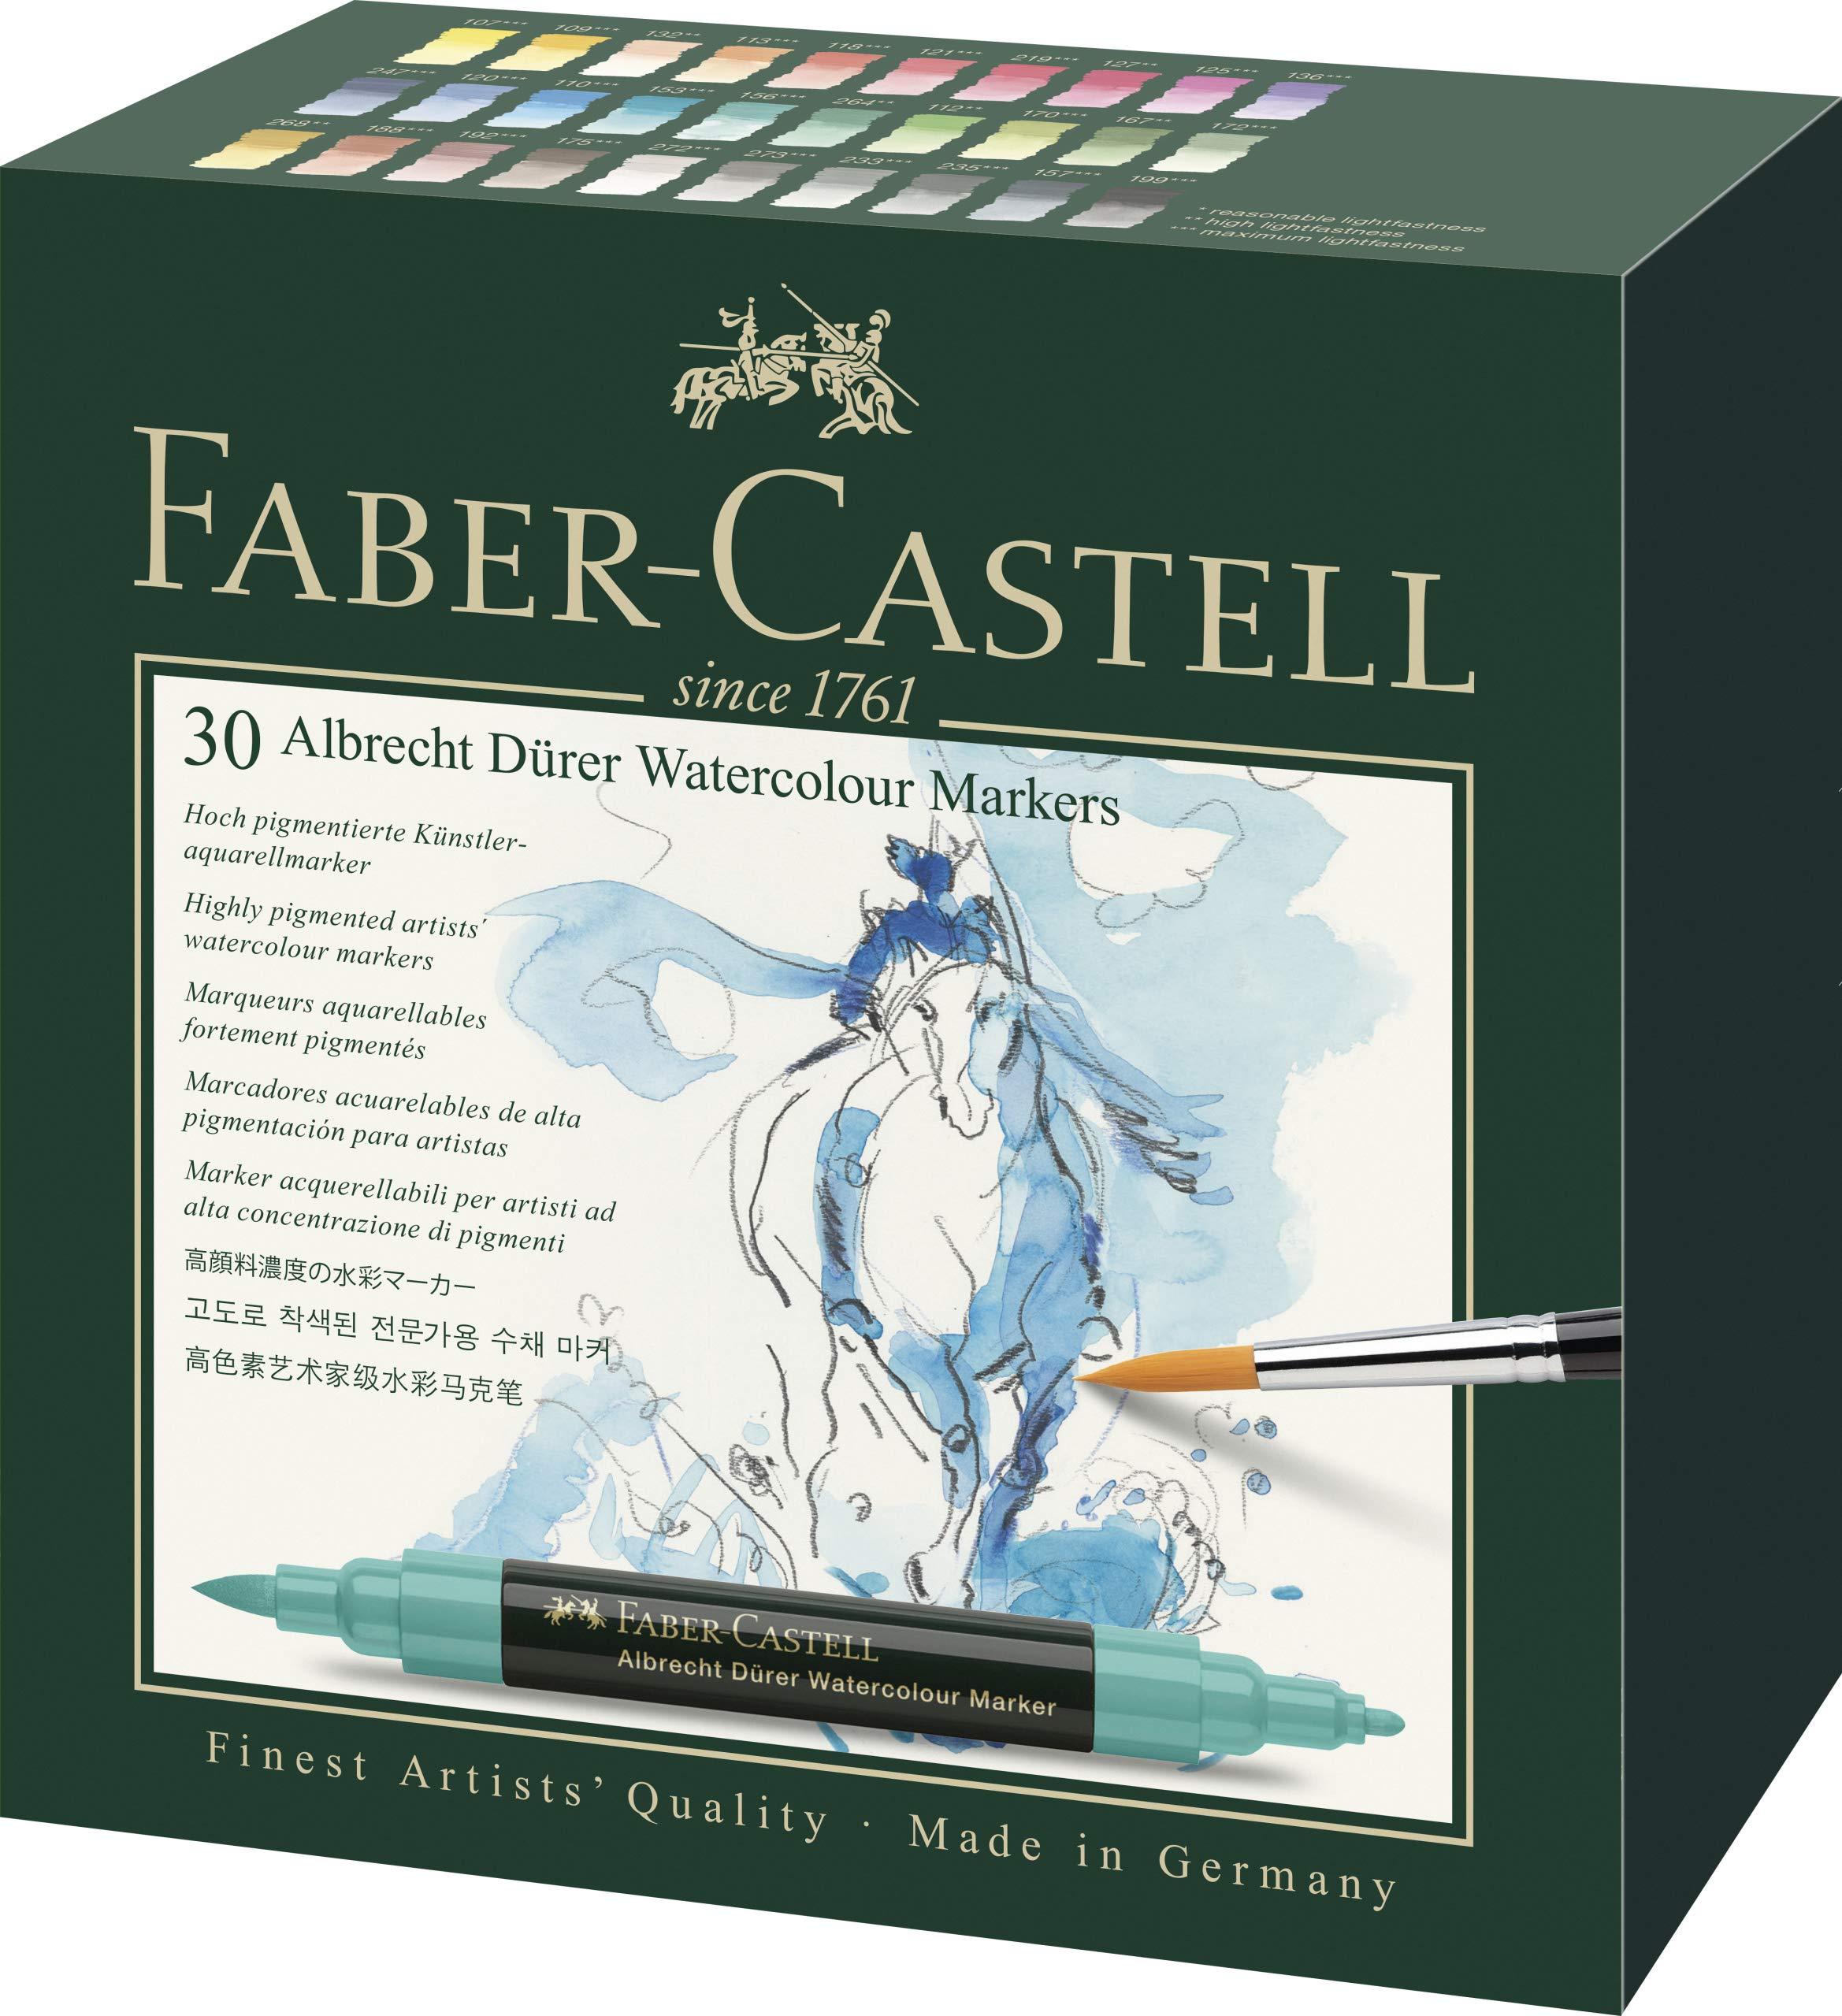 Faber-Castell Albrecht Durer Artists' Watercolor Markers - 30 Assorted Colors - Multipurpose Art Markers